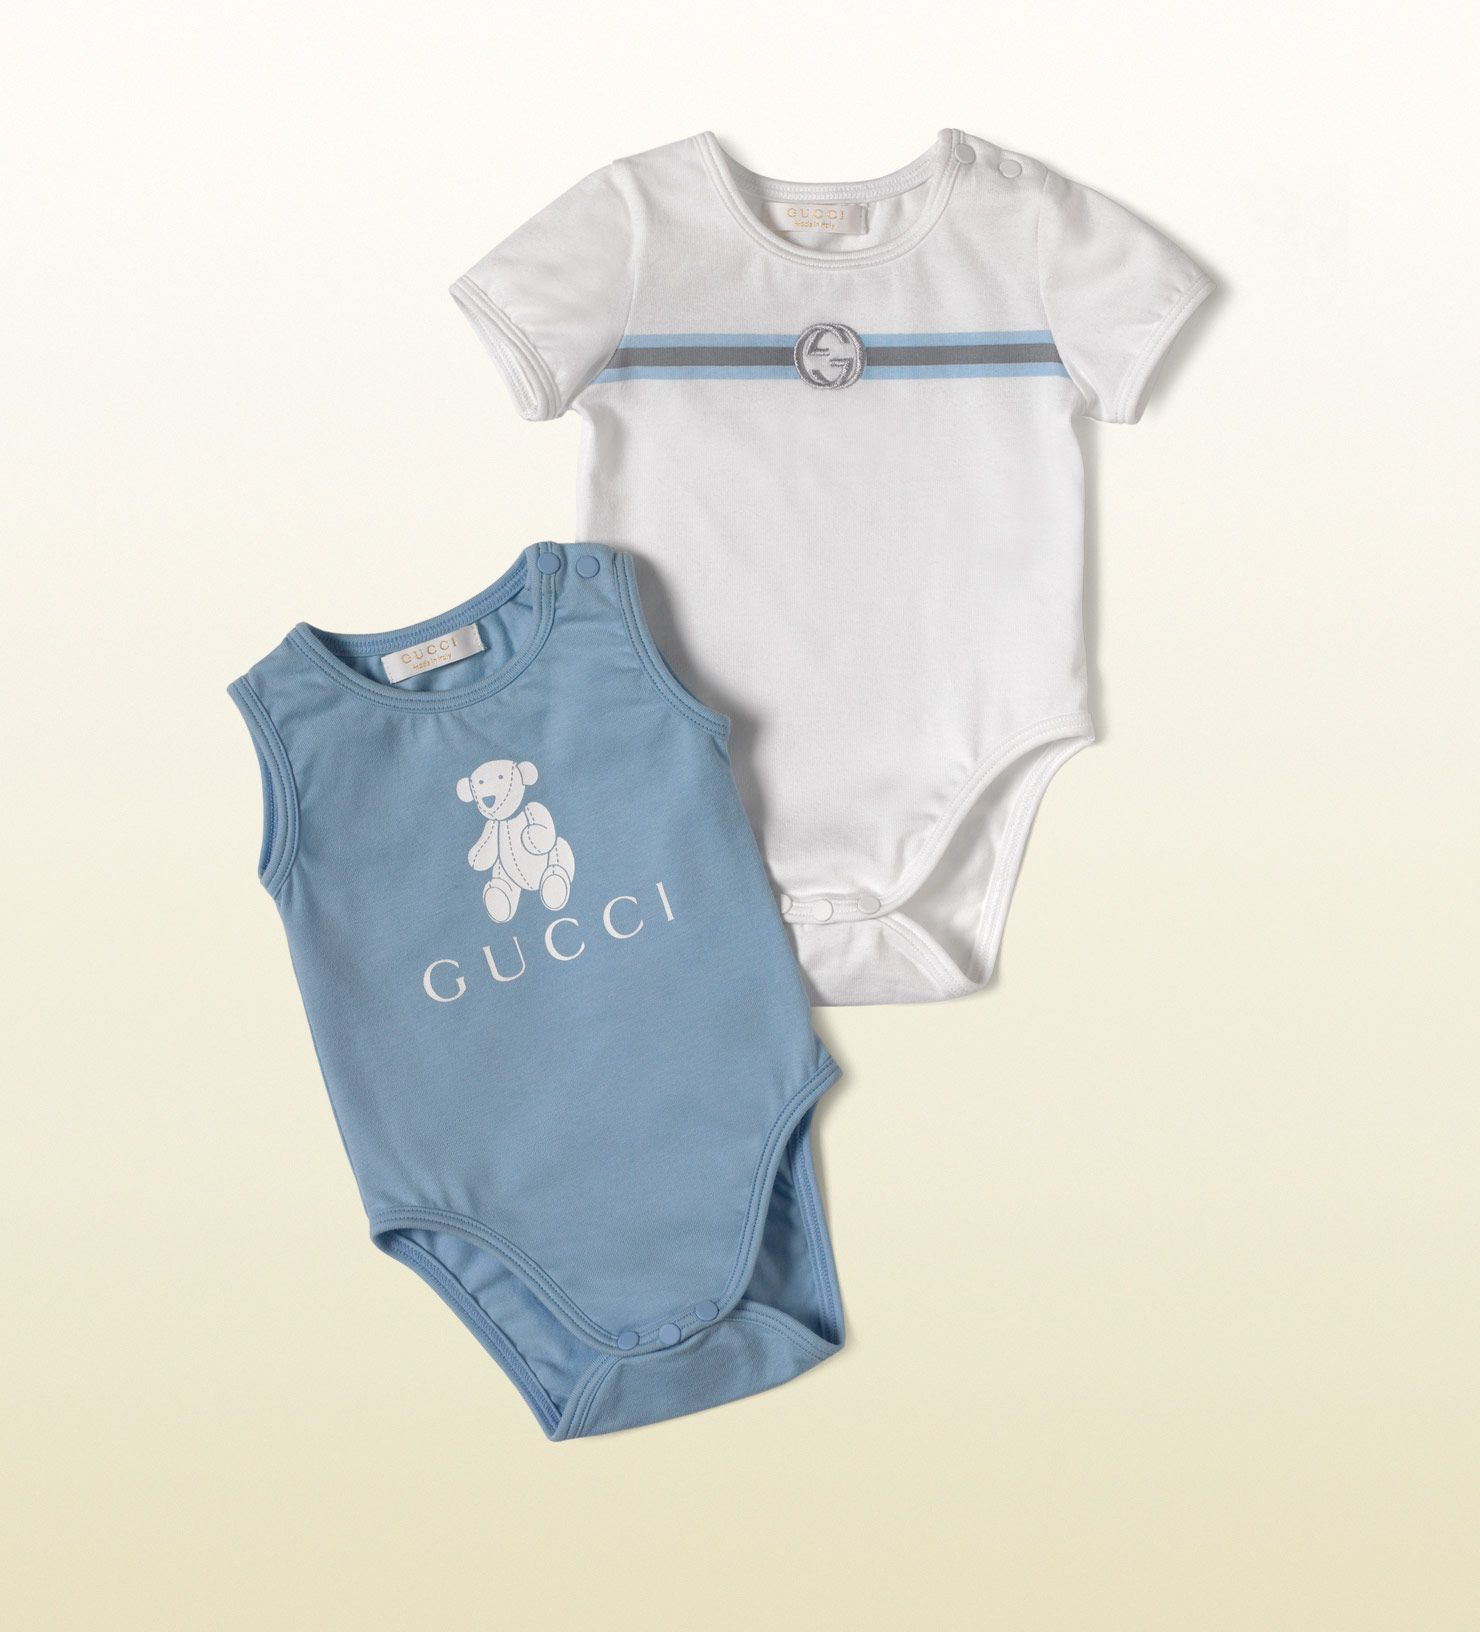 Baby Boys Girls Newborn 3 Piece Clothing Gift Set Sleepsuit Bib Hat Babies Baby Suit